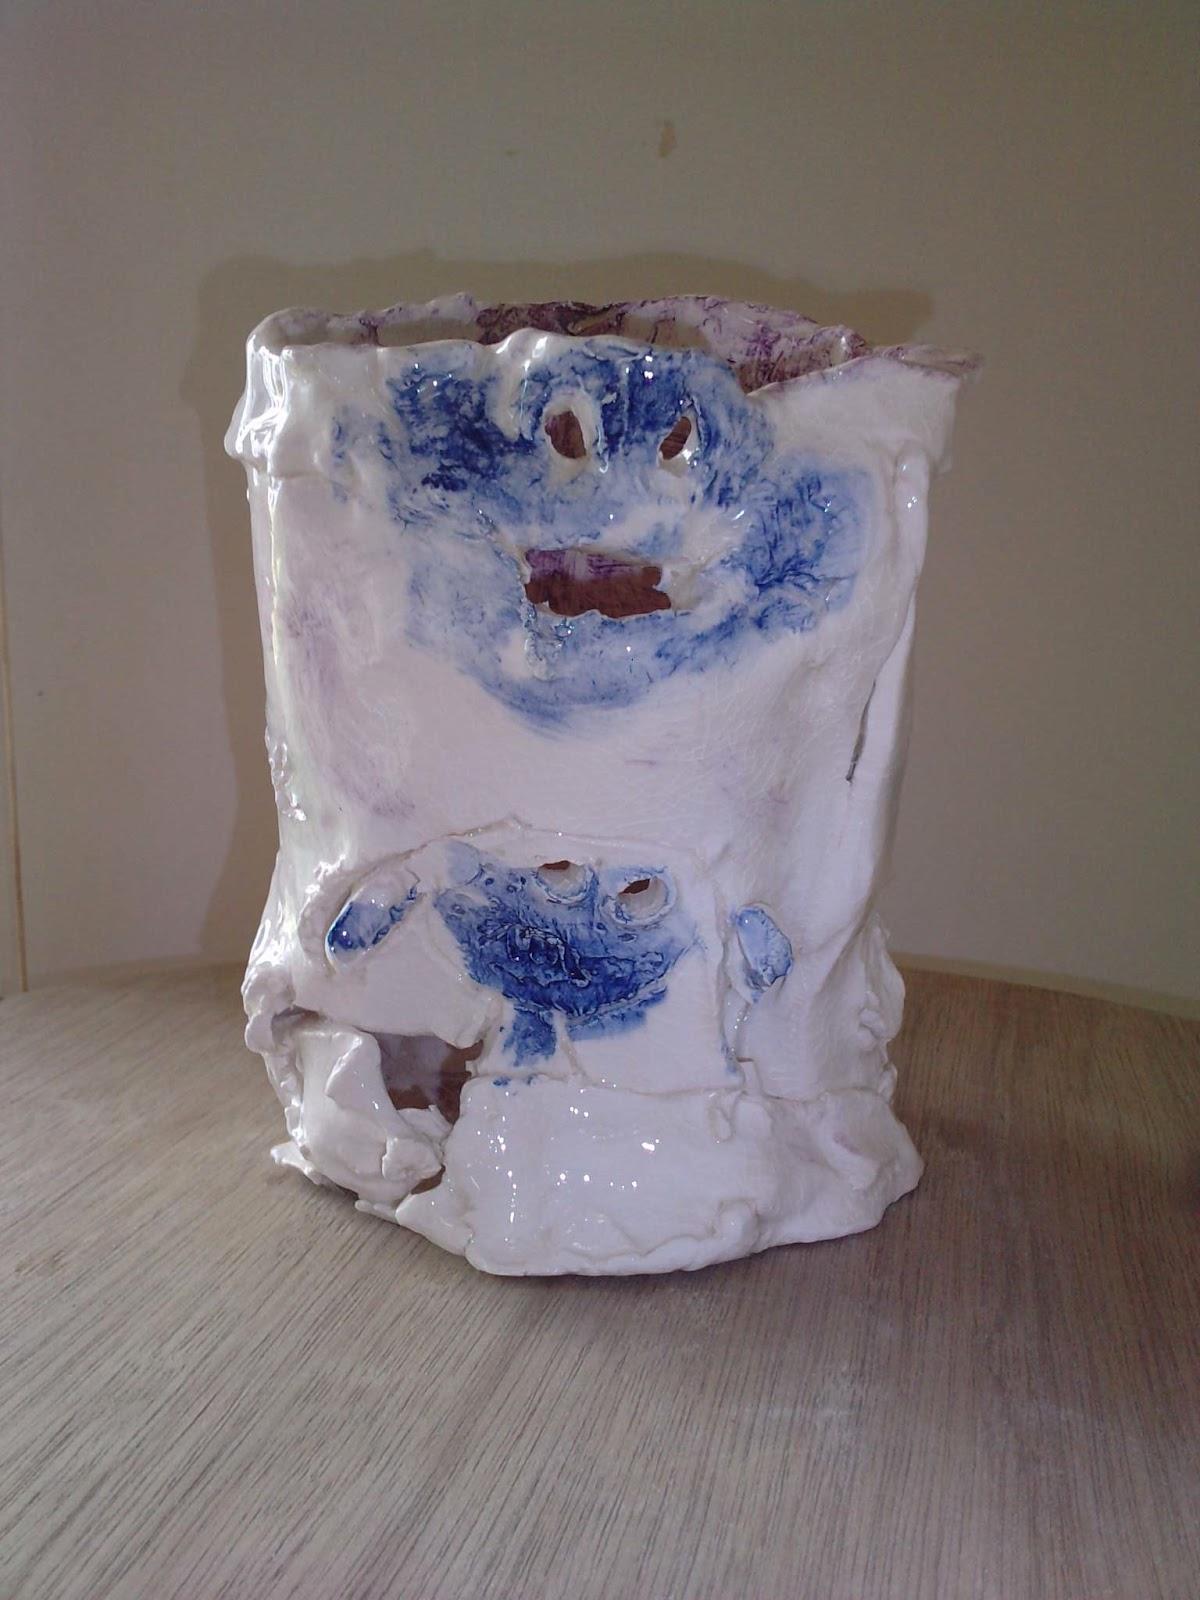 http://3.bp.blogspot.com/-k_4ex07Jw9U/Tz-7H7jFGkI/AAAAAAAAB3A/i7LIXRMwD6A/s1600/Vase+gypso.JPG